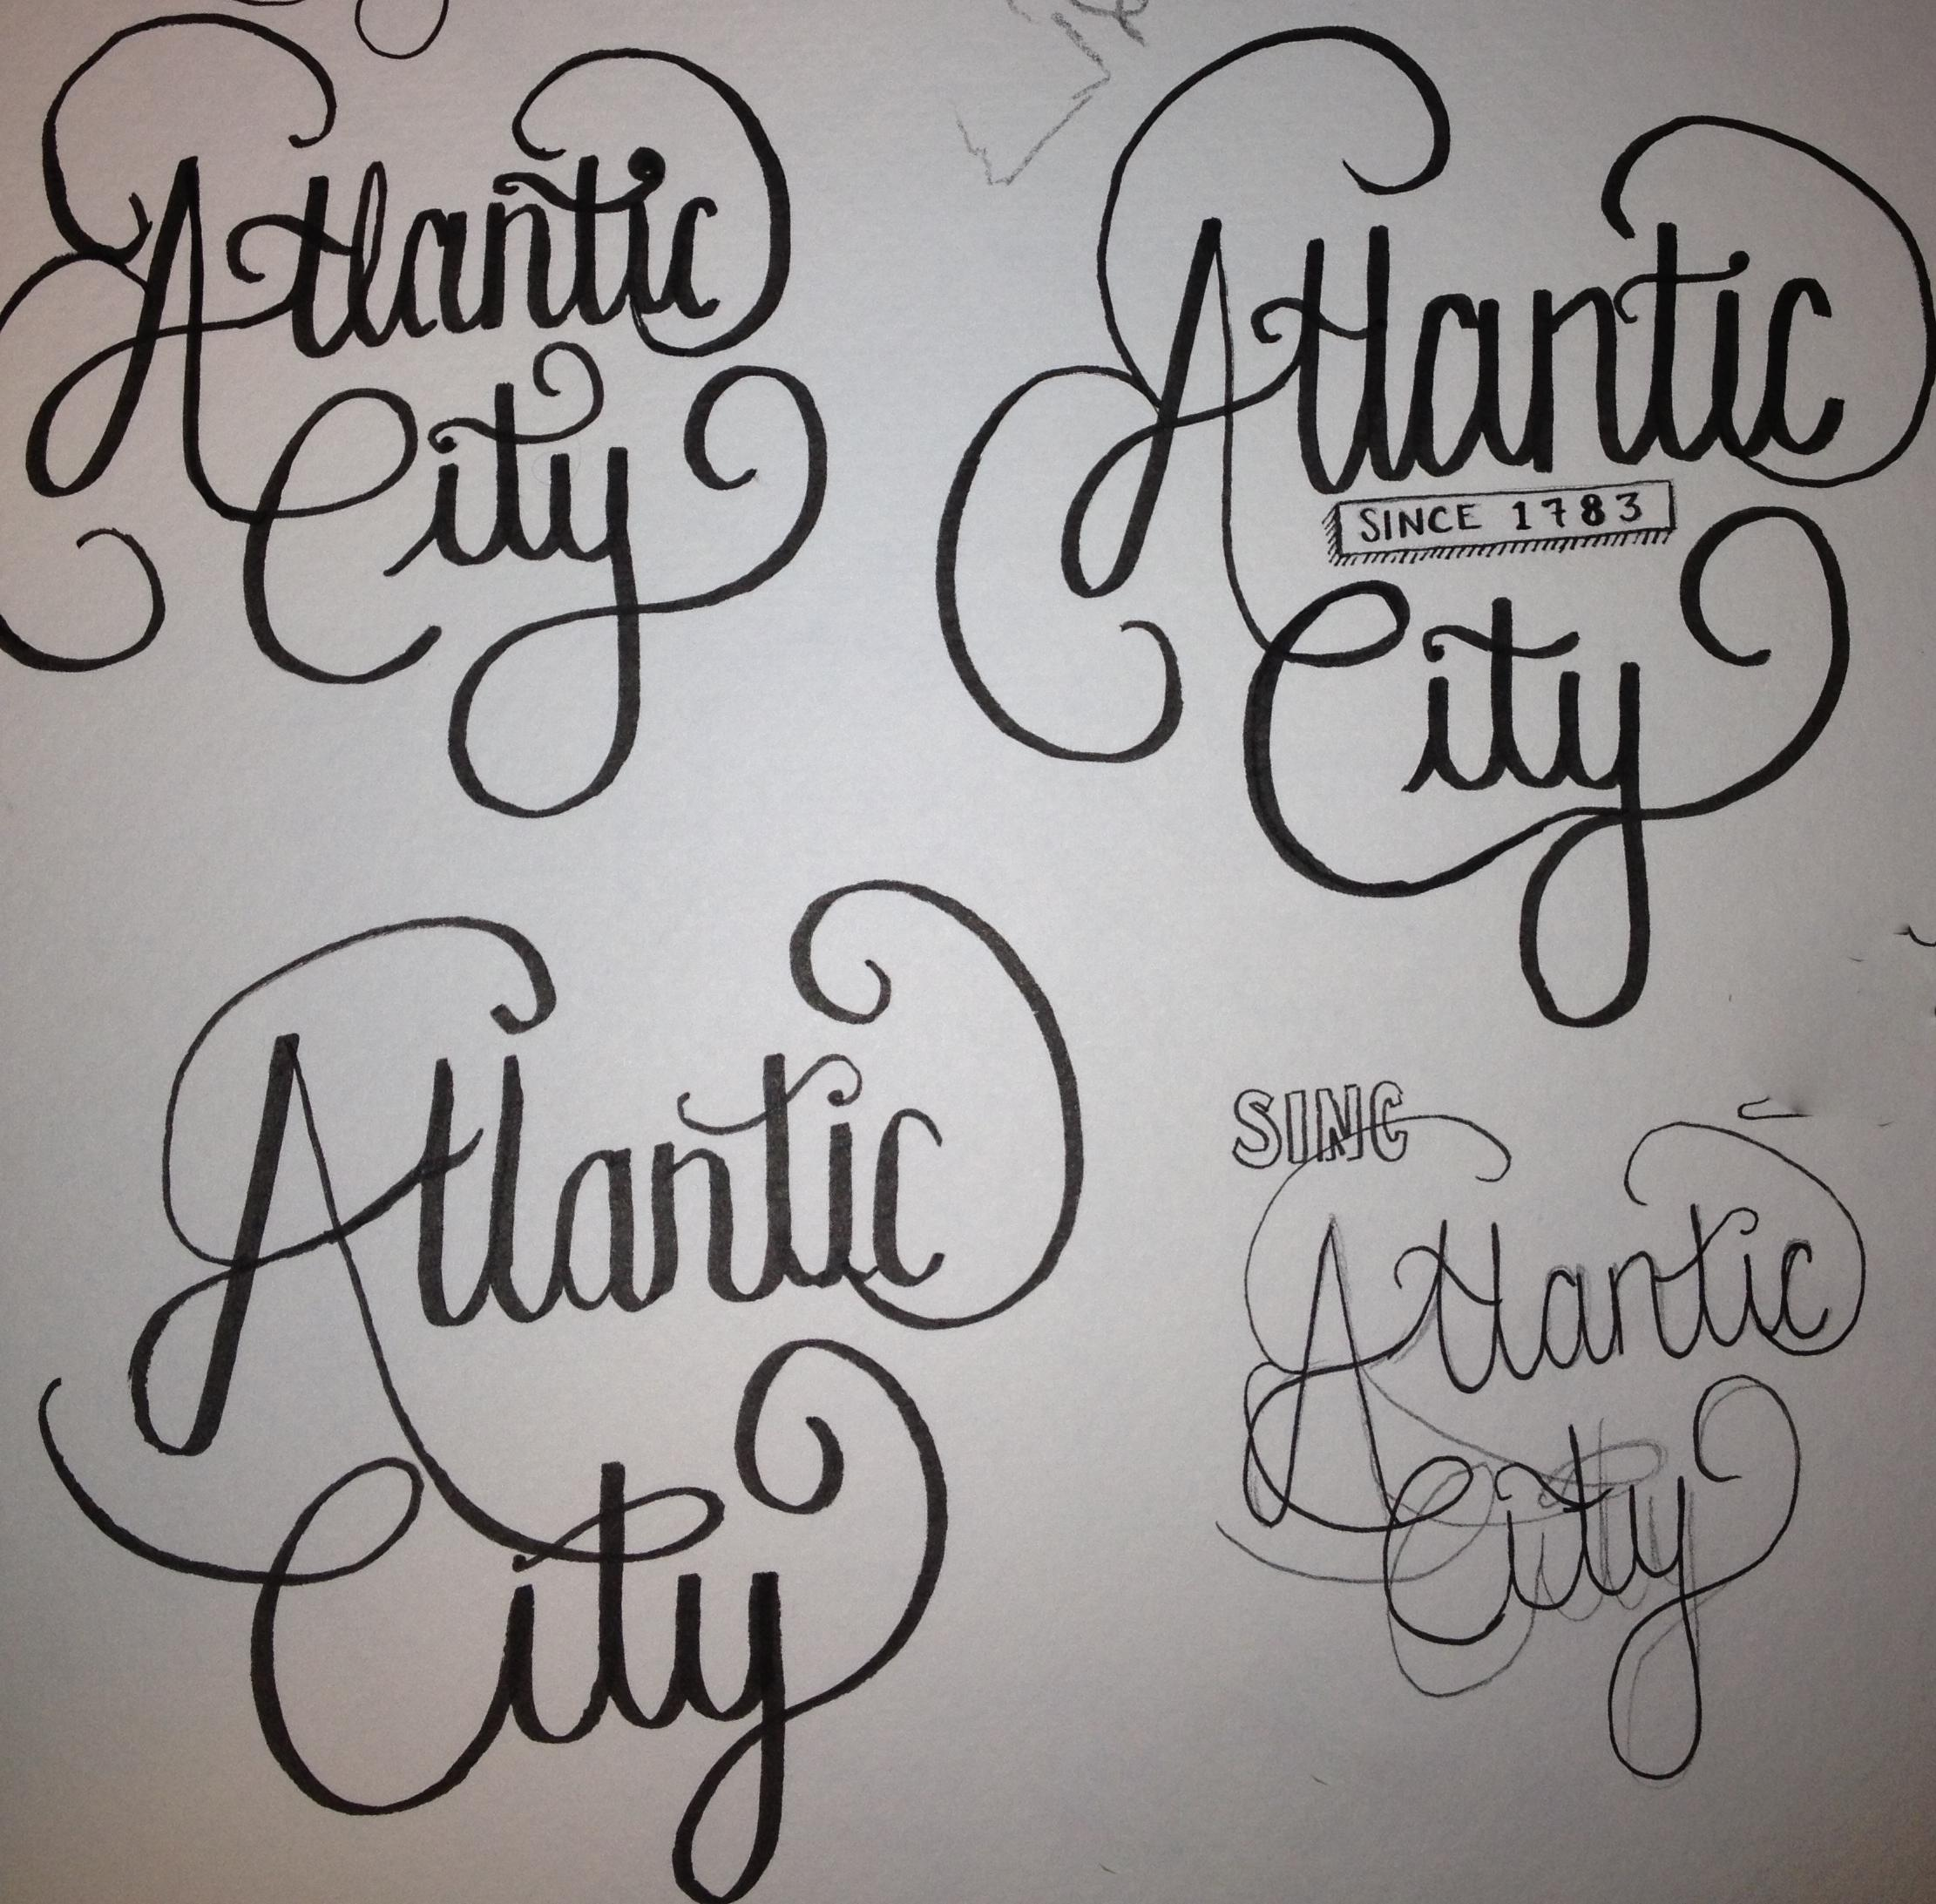 Atlantic City - image 1 - student project